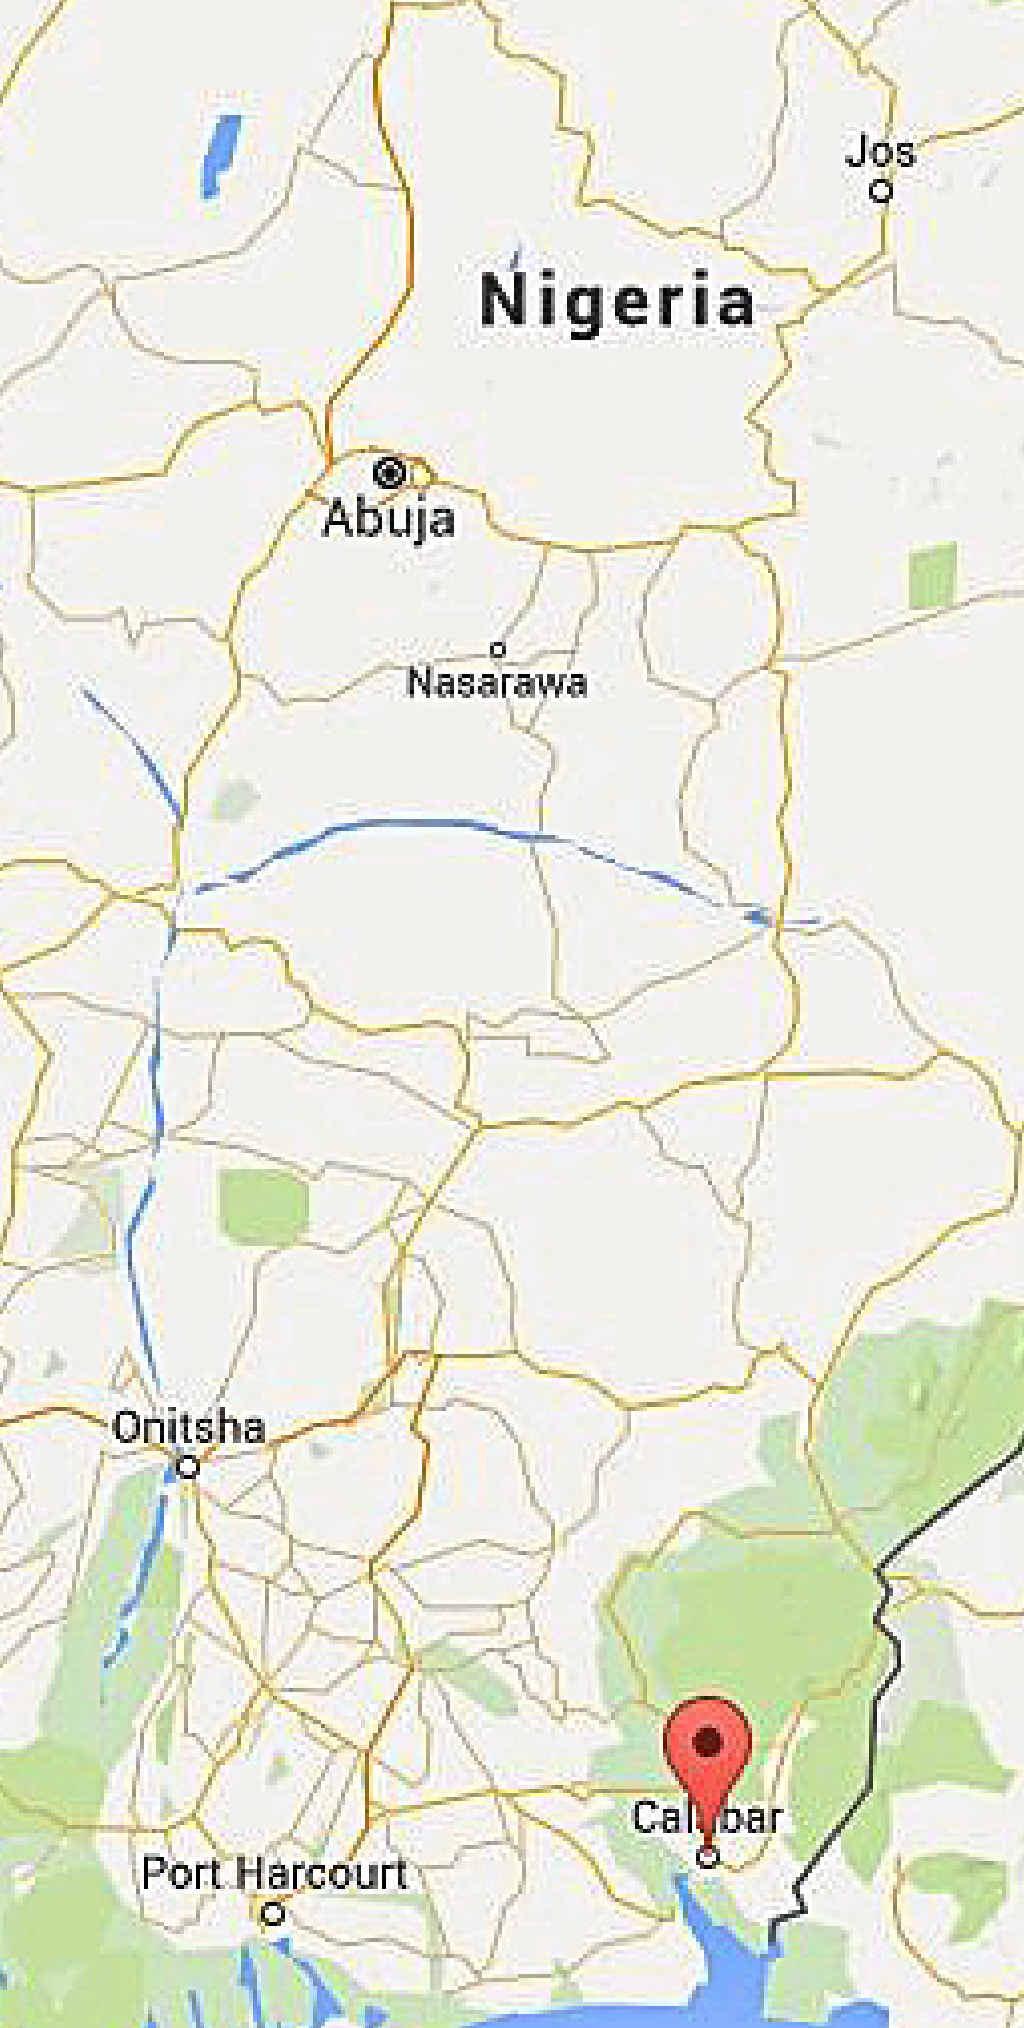 Calbar, Nigeria